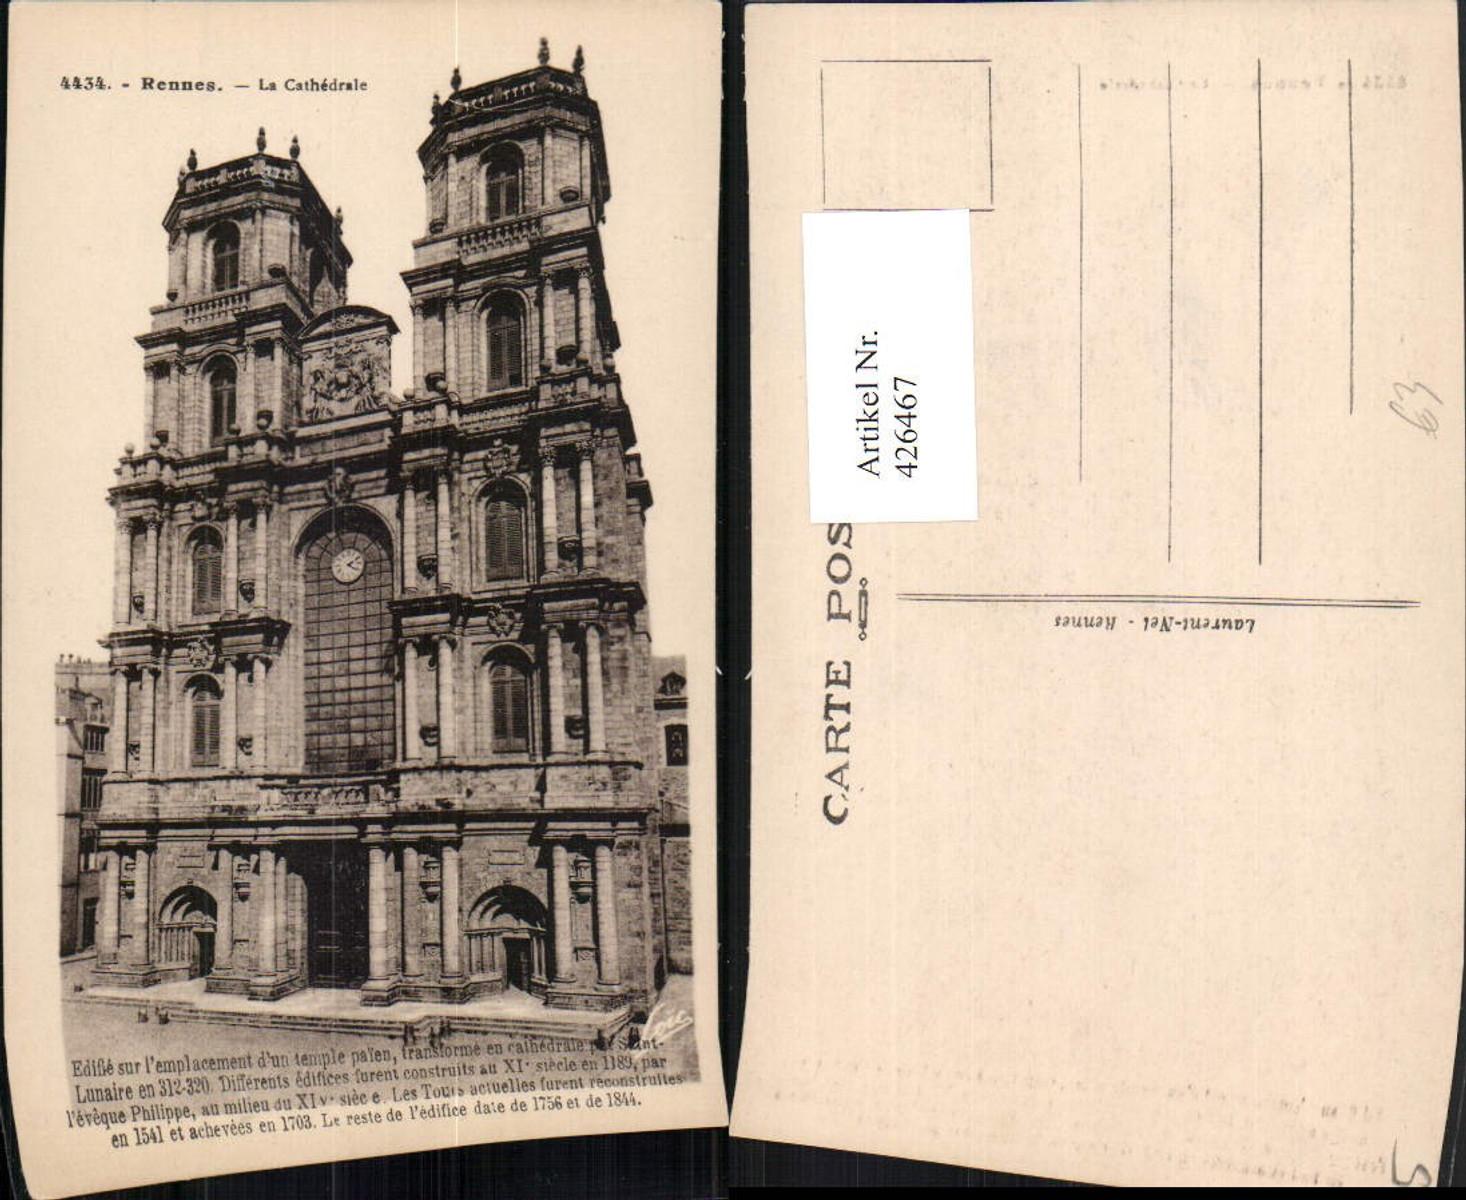 426467,Bretagne Ille-et-Vilaine Rennes La Cathedrale Kirche günstig online kaufen